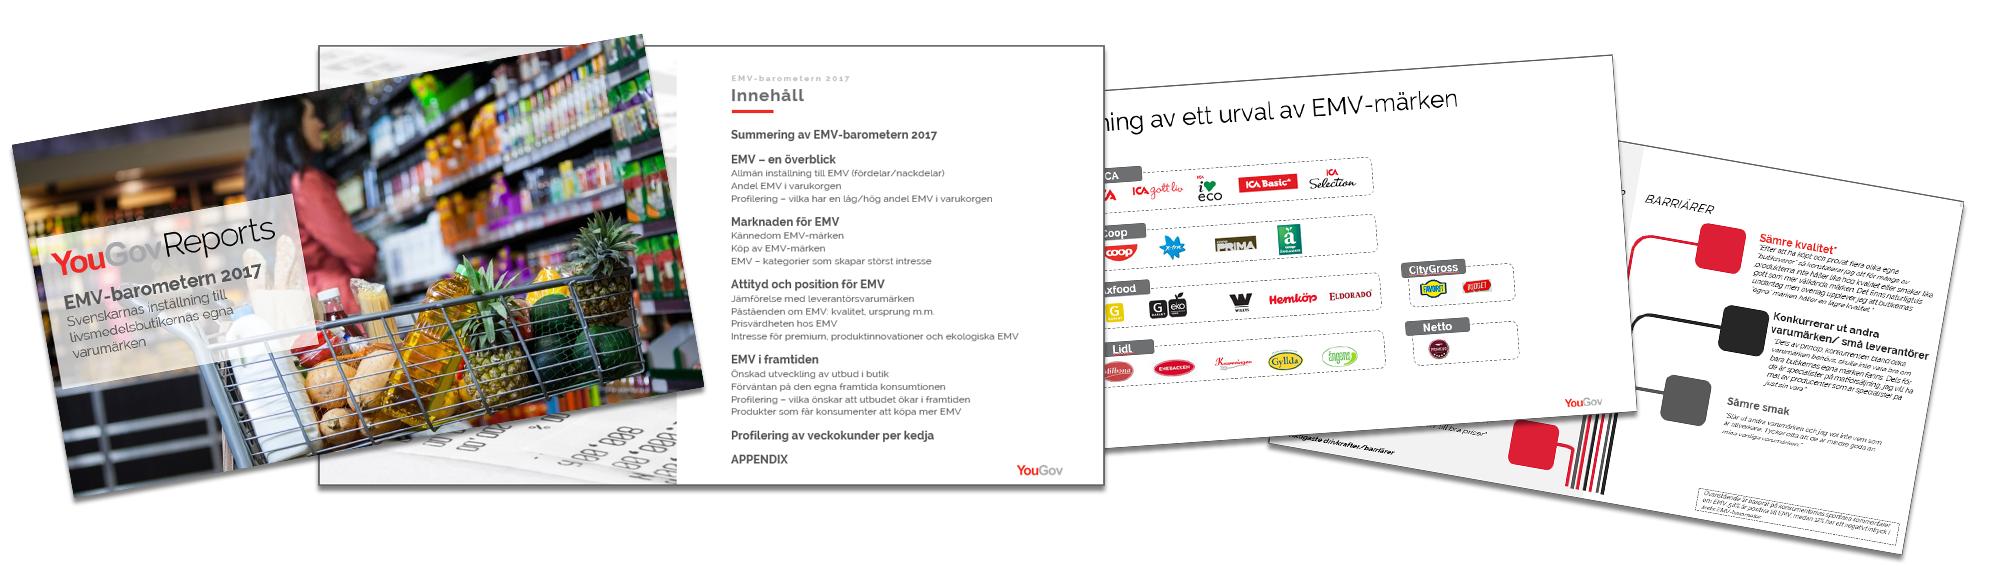 EMV-barometern 2017